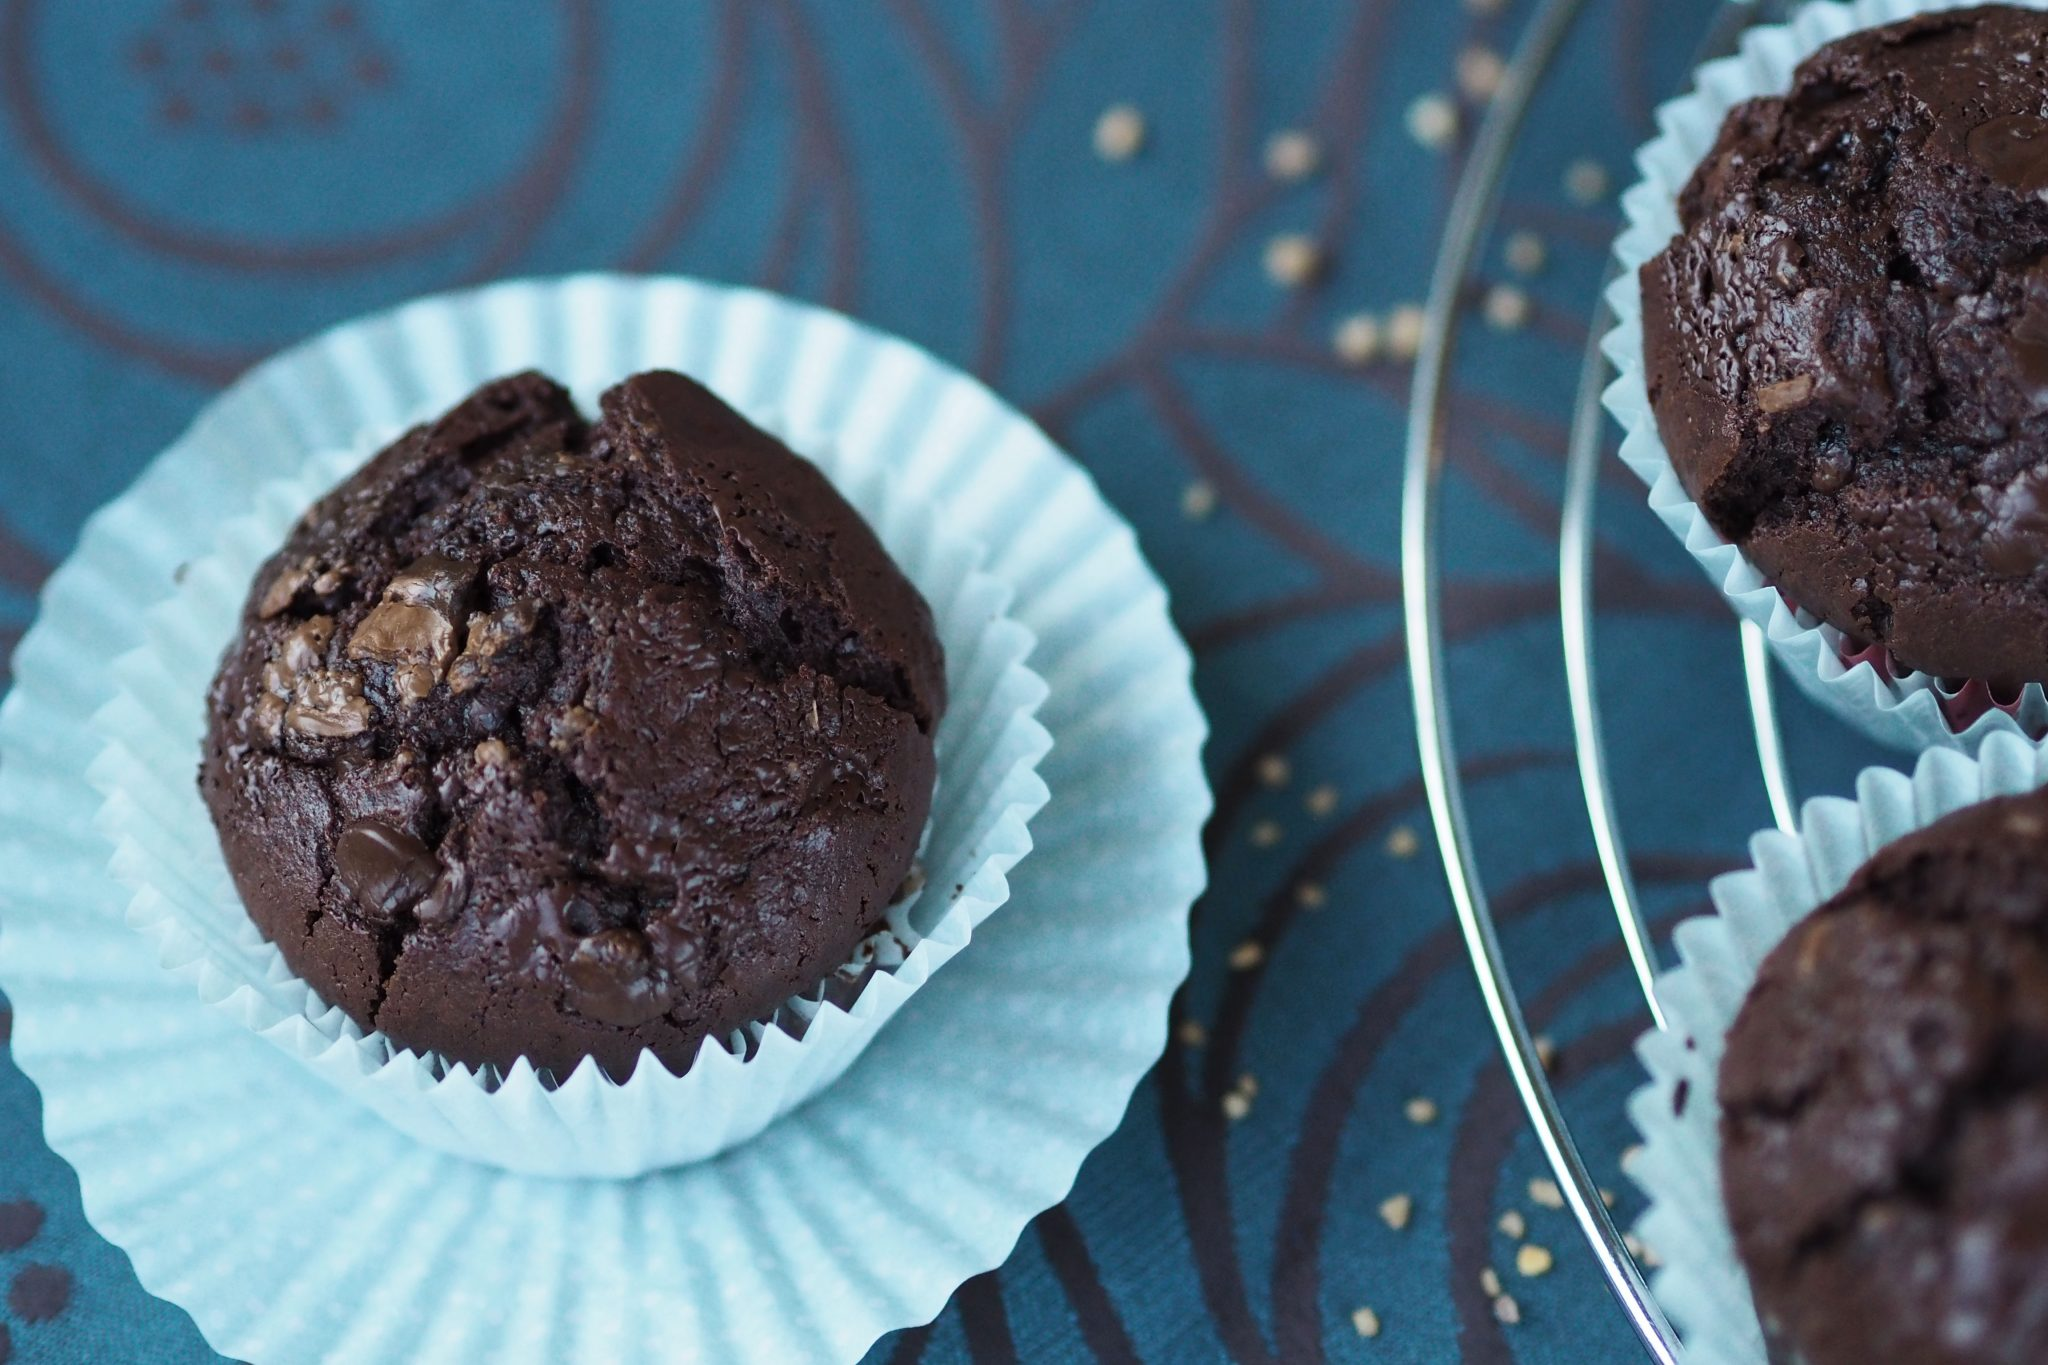 Schokoladen Kaffee Muffins